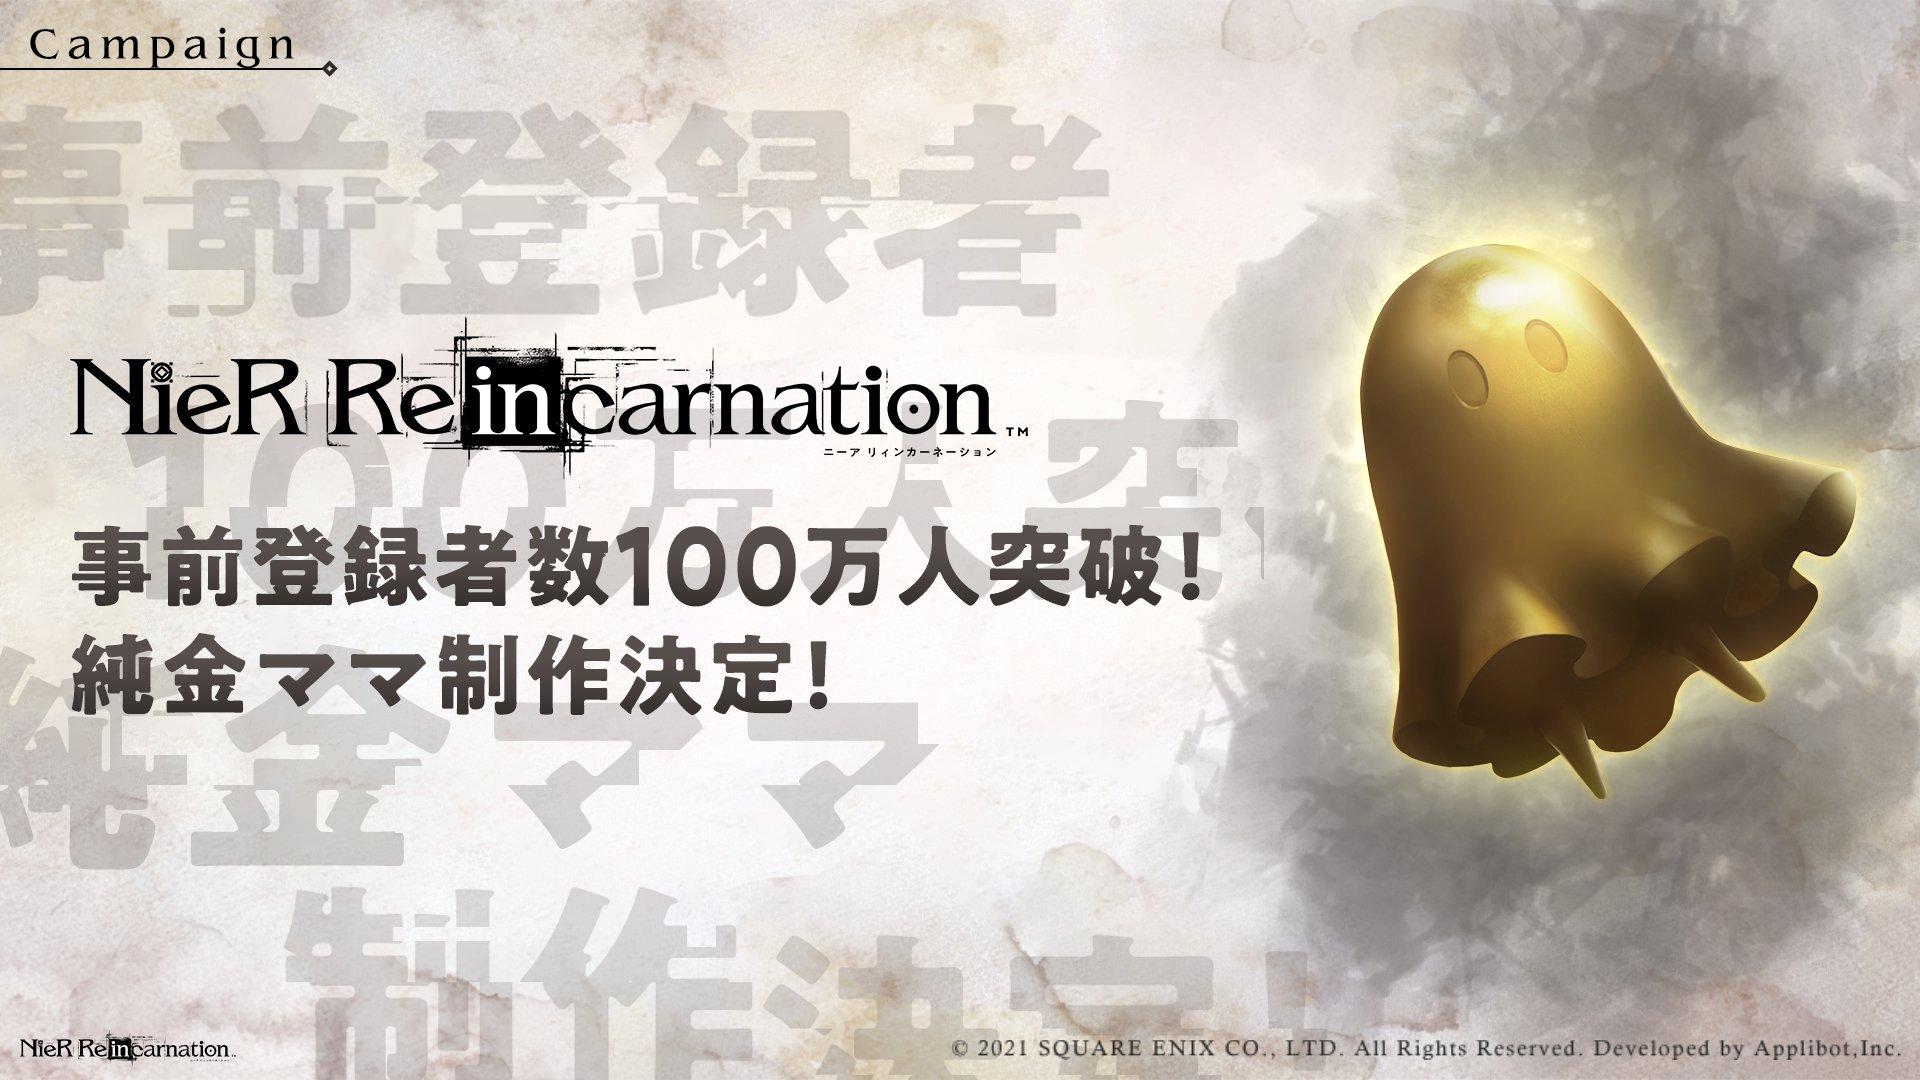 尼尔手游《NieR Re[in]carnation》事前登陆突破100万